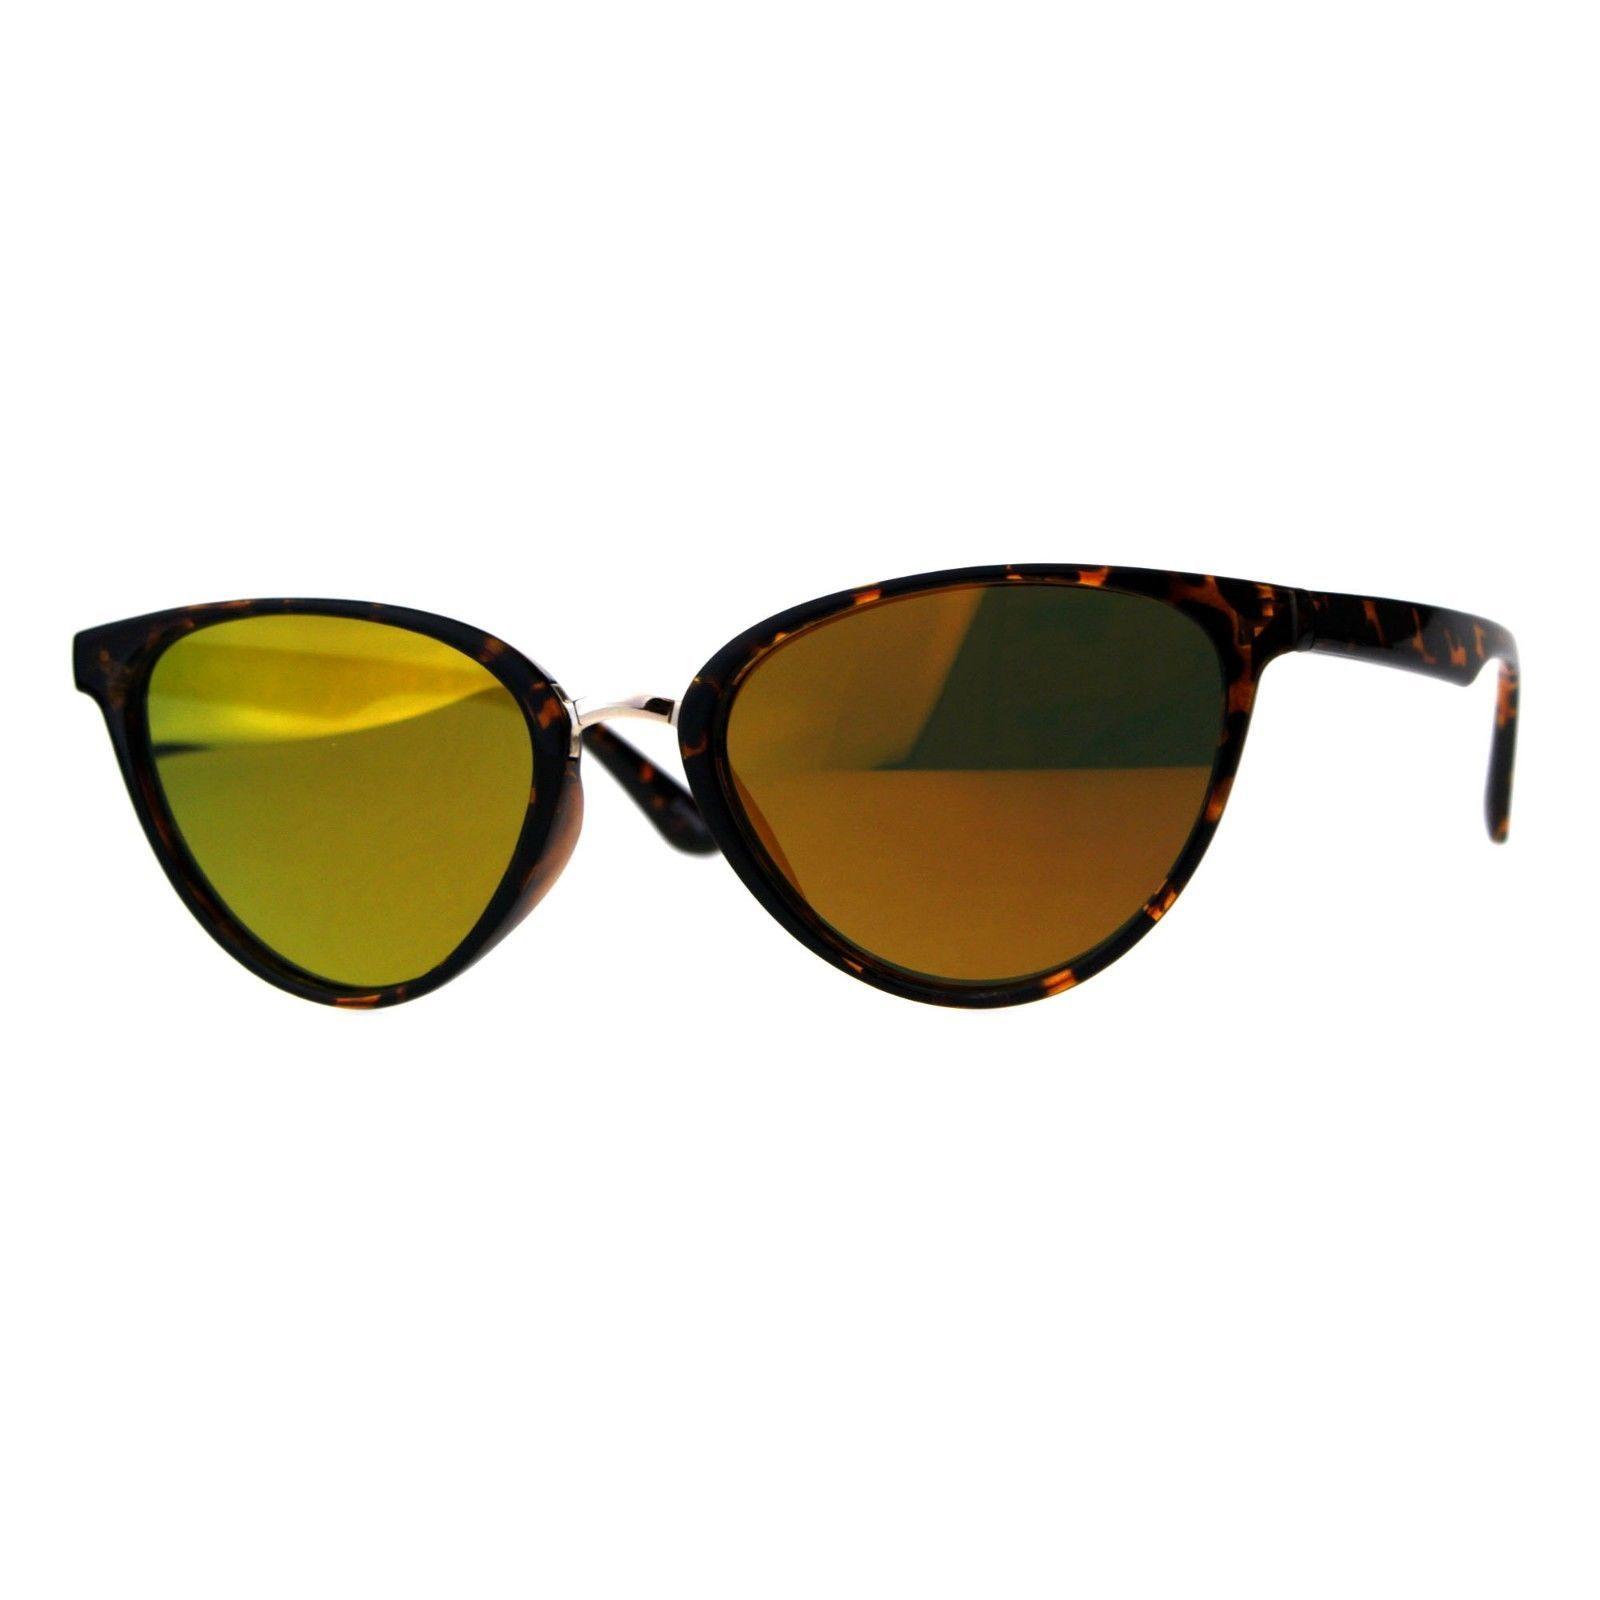 Womens Sunglasses Designer Fashion Triangular Oval Mirror Lens UV 400